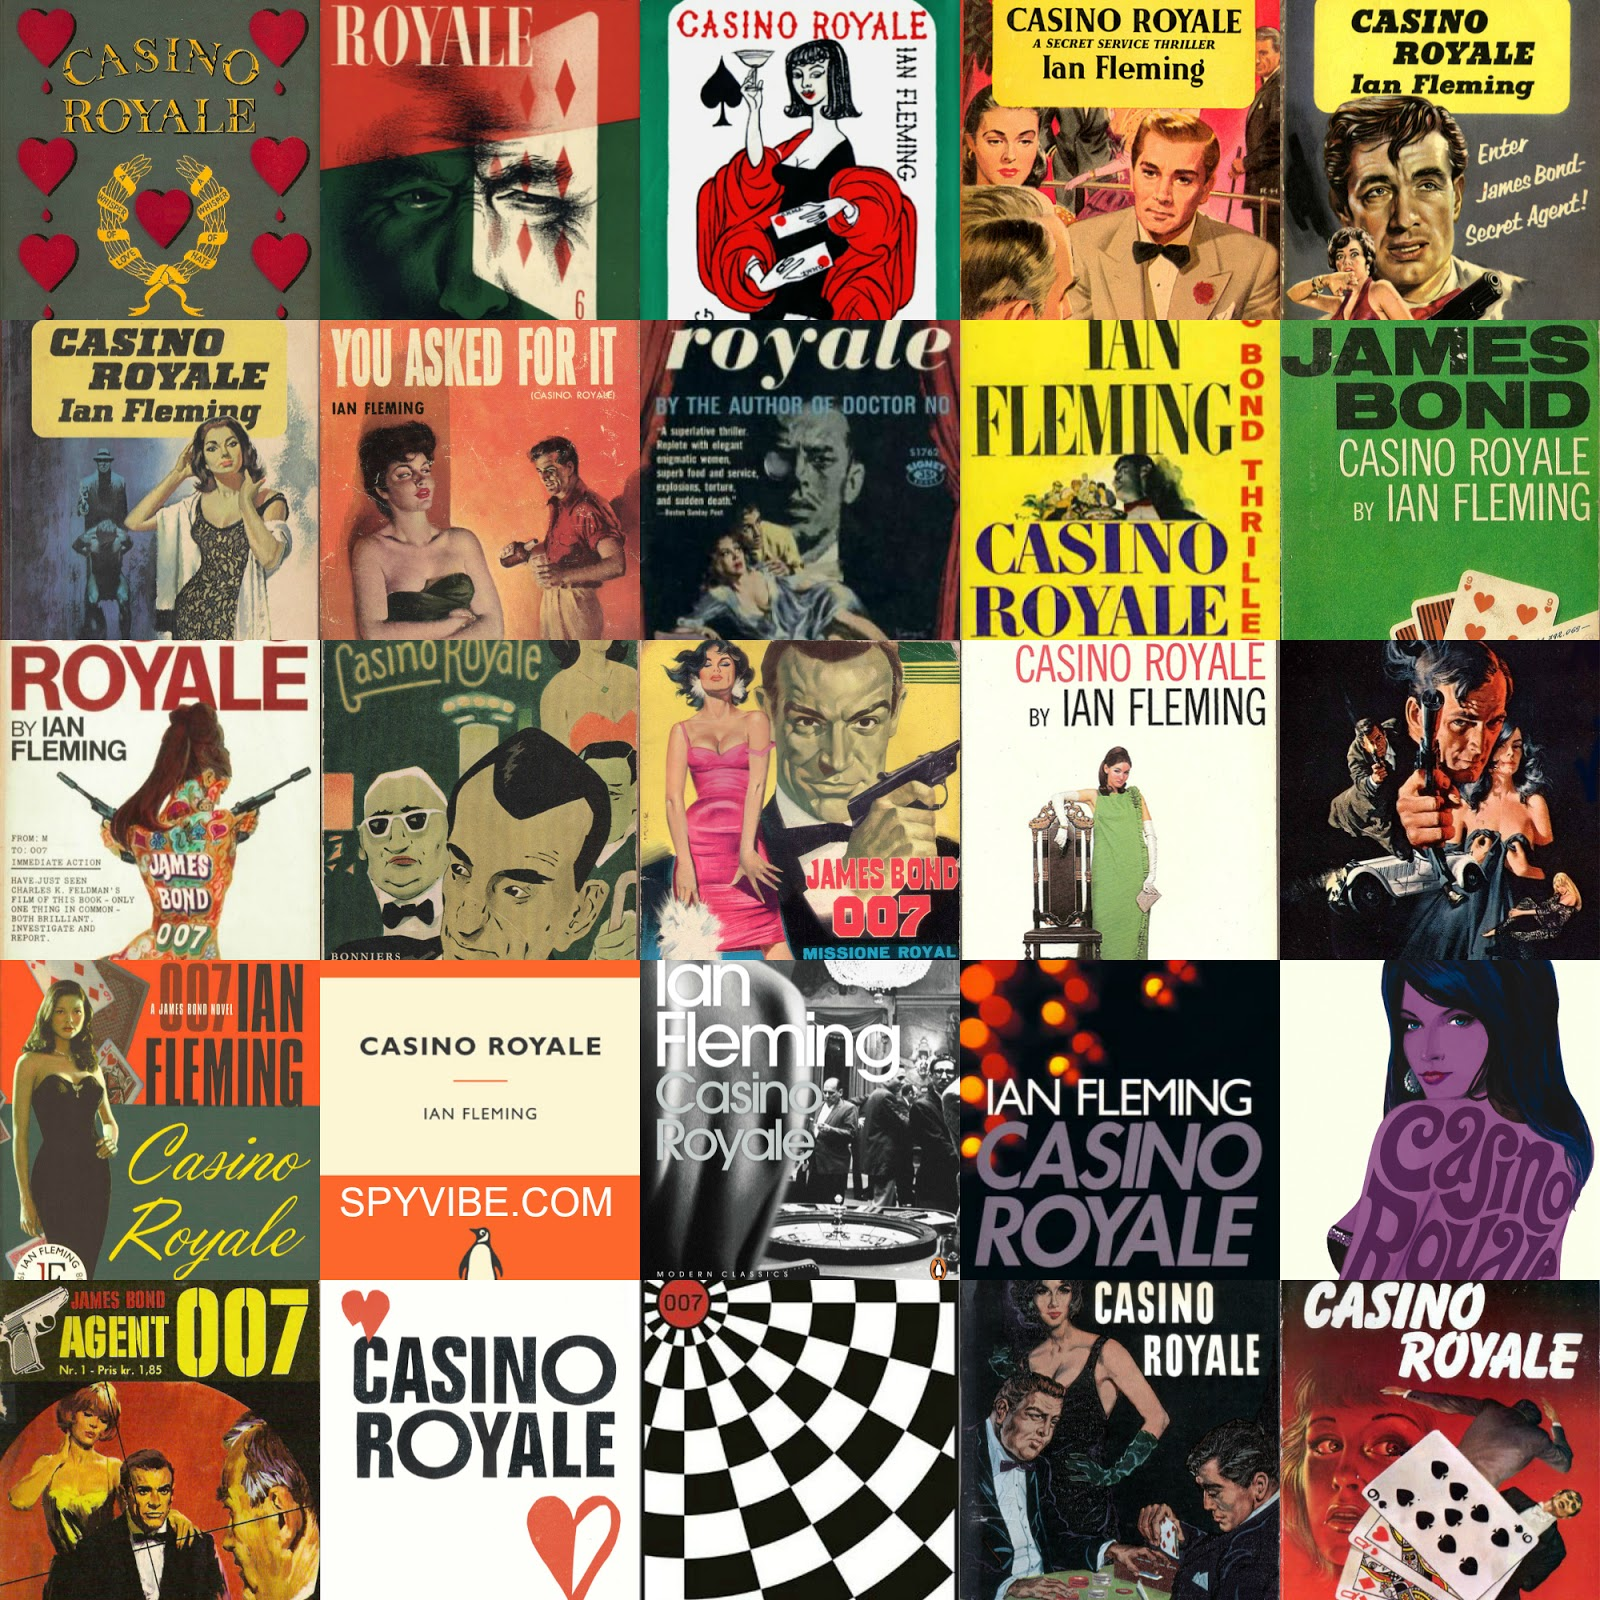 Ian Fleming Casino Royale